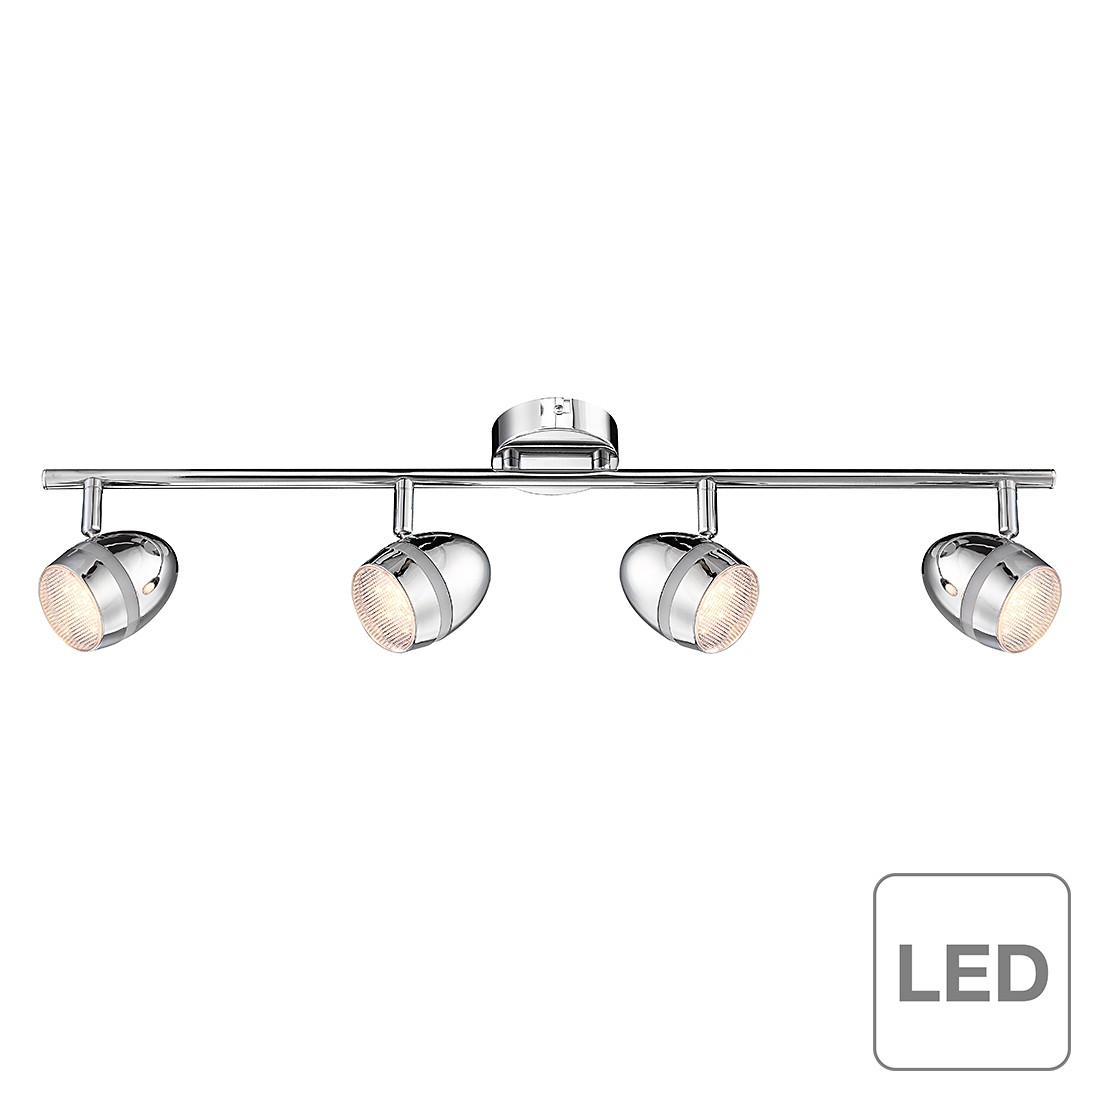 Wohnzimmerbeleuchtung decke wand led halogen lampen for Lampen strahler decke